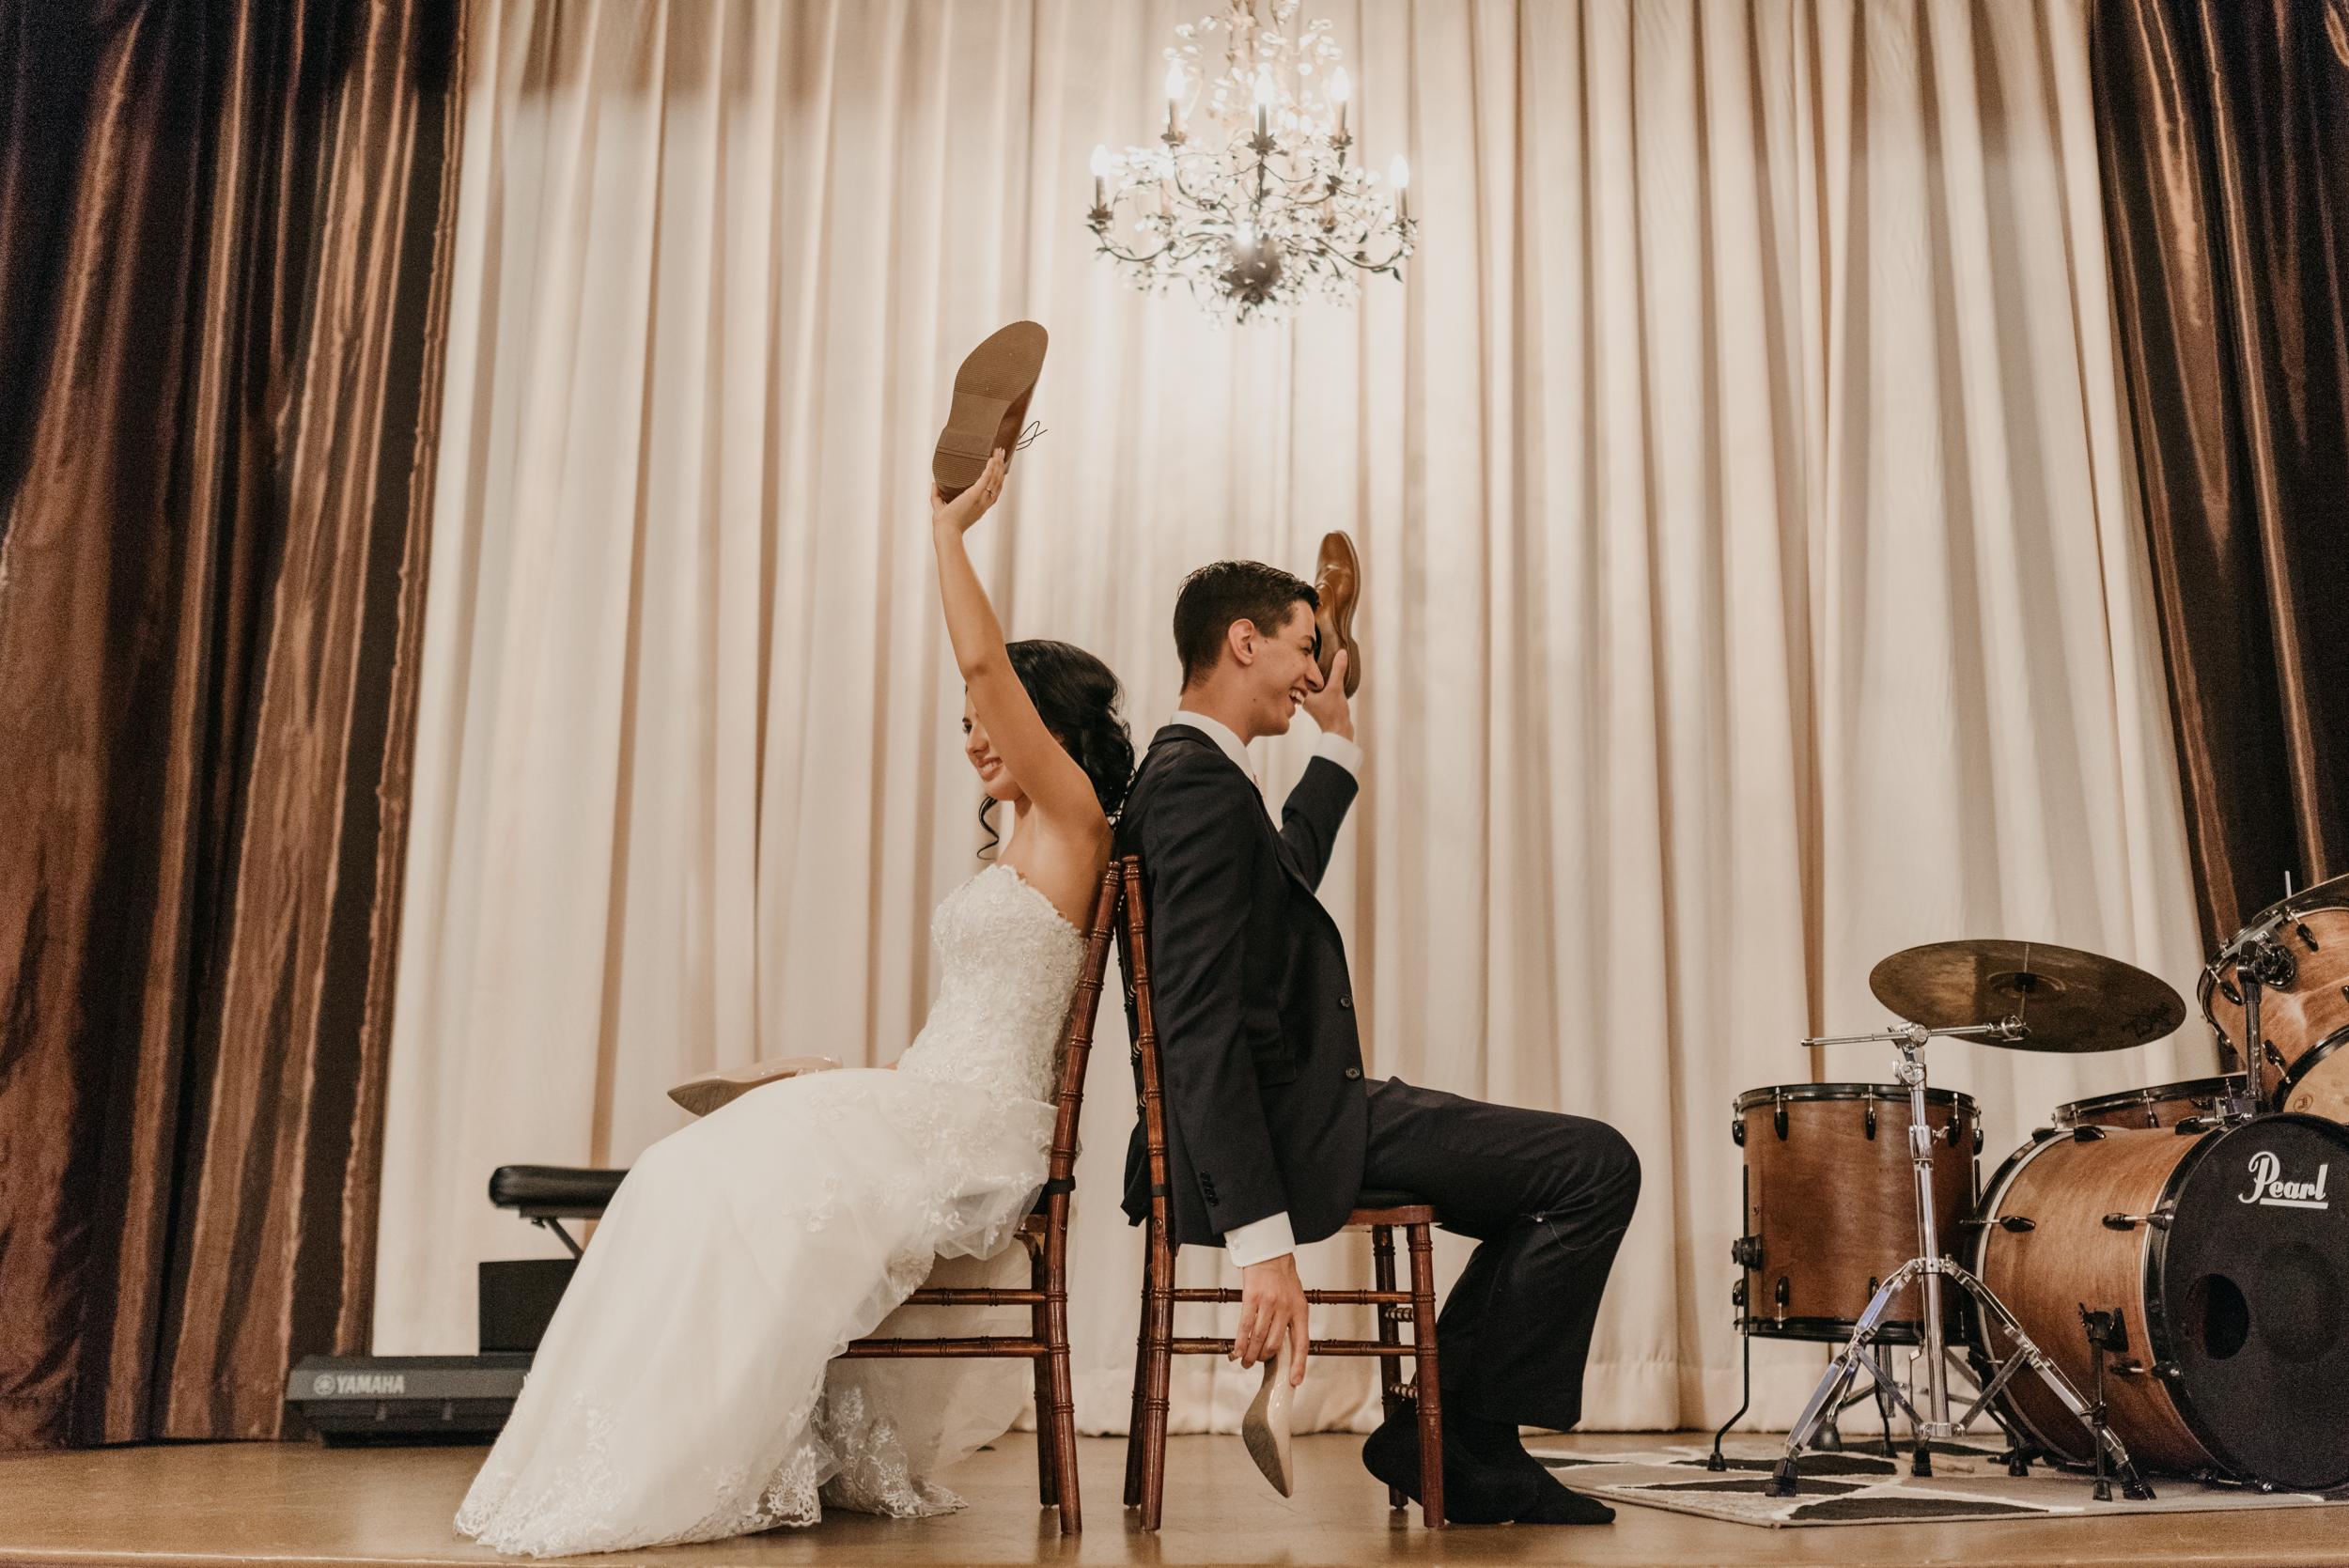 130-reception-west-end-ballroom-portland-wedding-photographer-8875.jpg